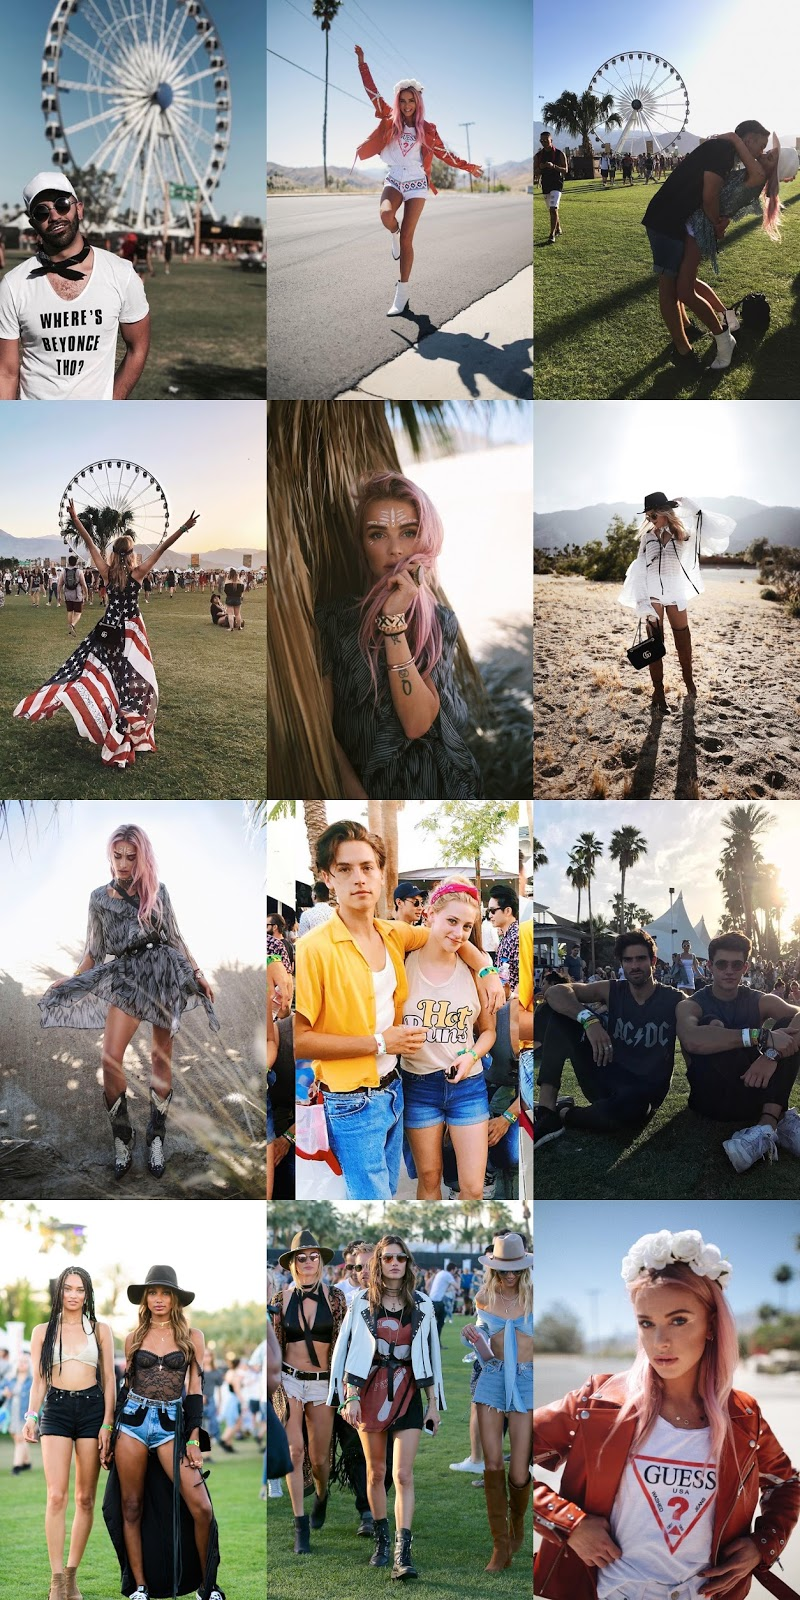 Coachella festival 2017 #1 - always be yourself